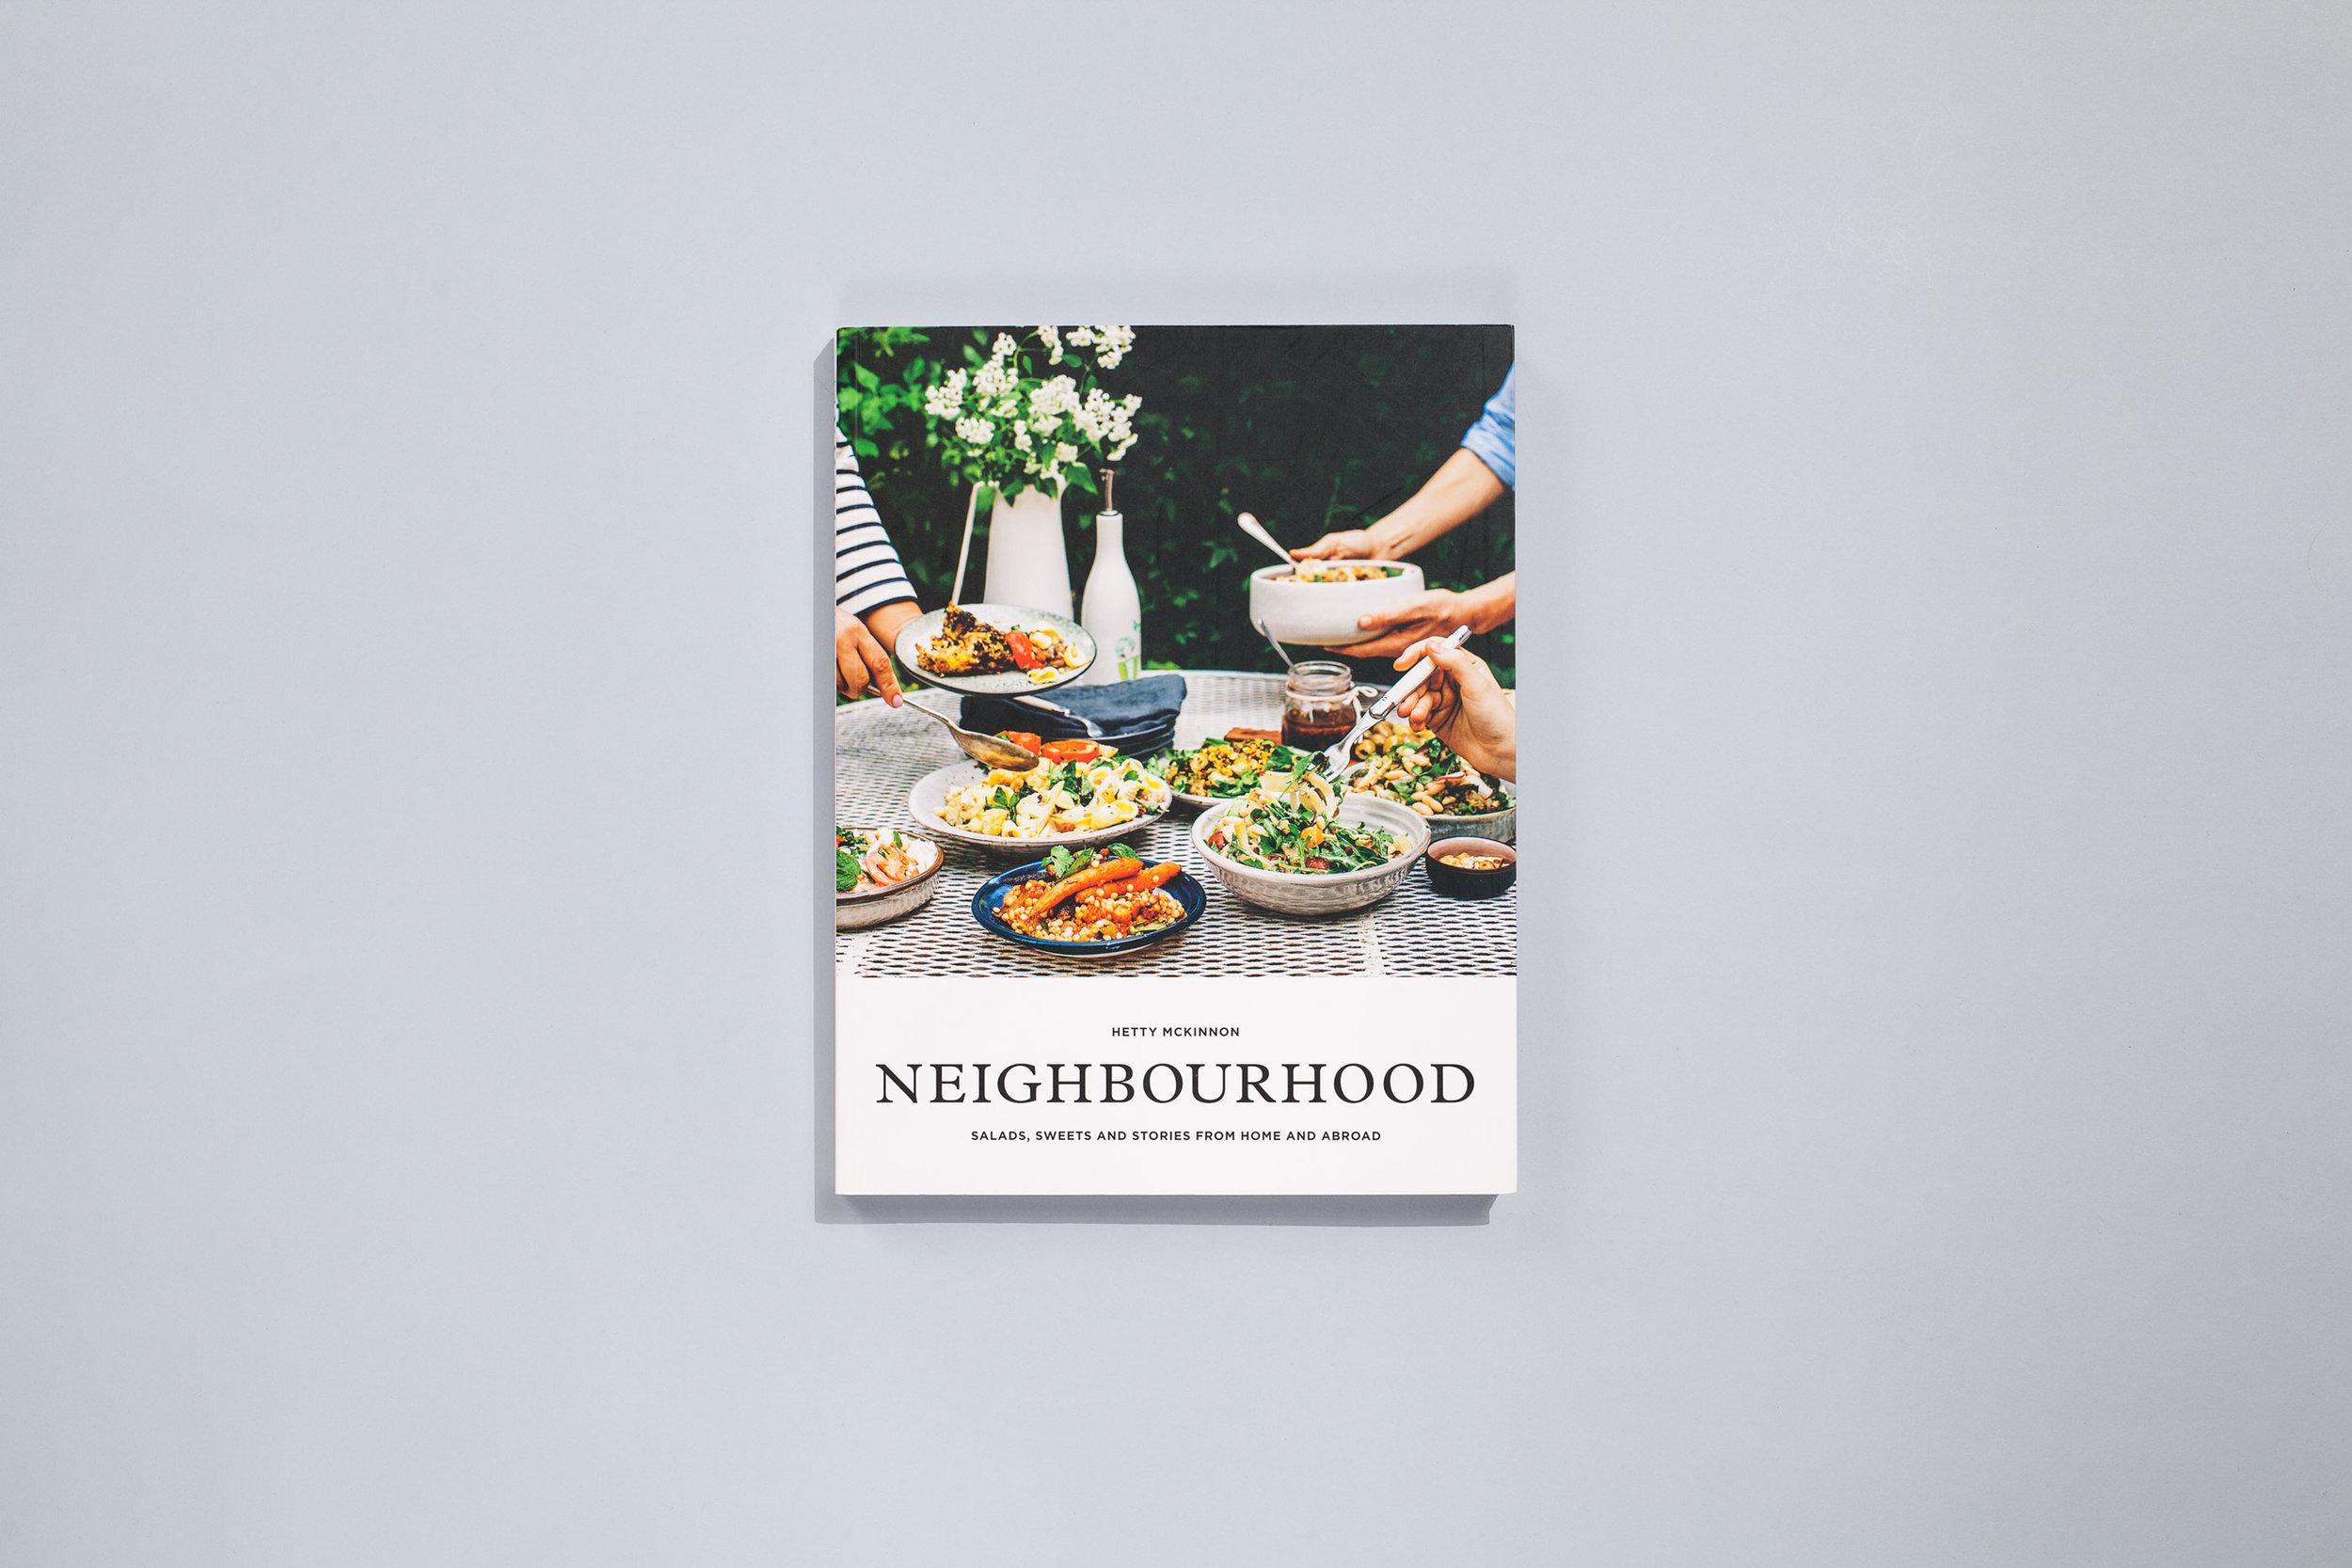 Title – Neighbourhood Author – Hetty McKinnon Designer – Daniel New Photographer – Luisa Brimble Styling – Erika Raxworthy Publisher – Plum